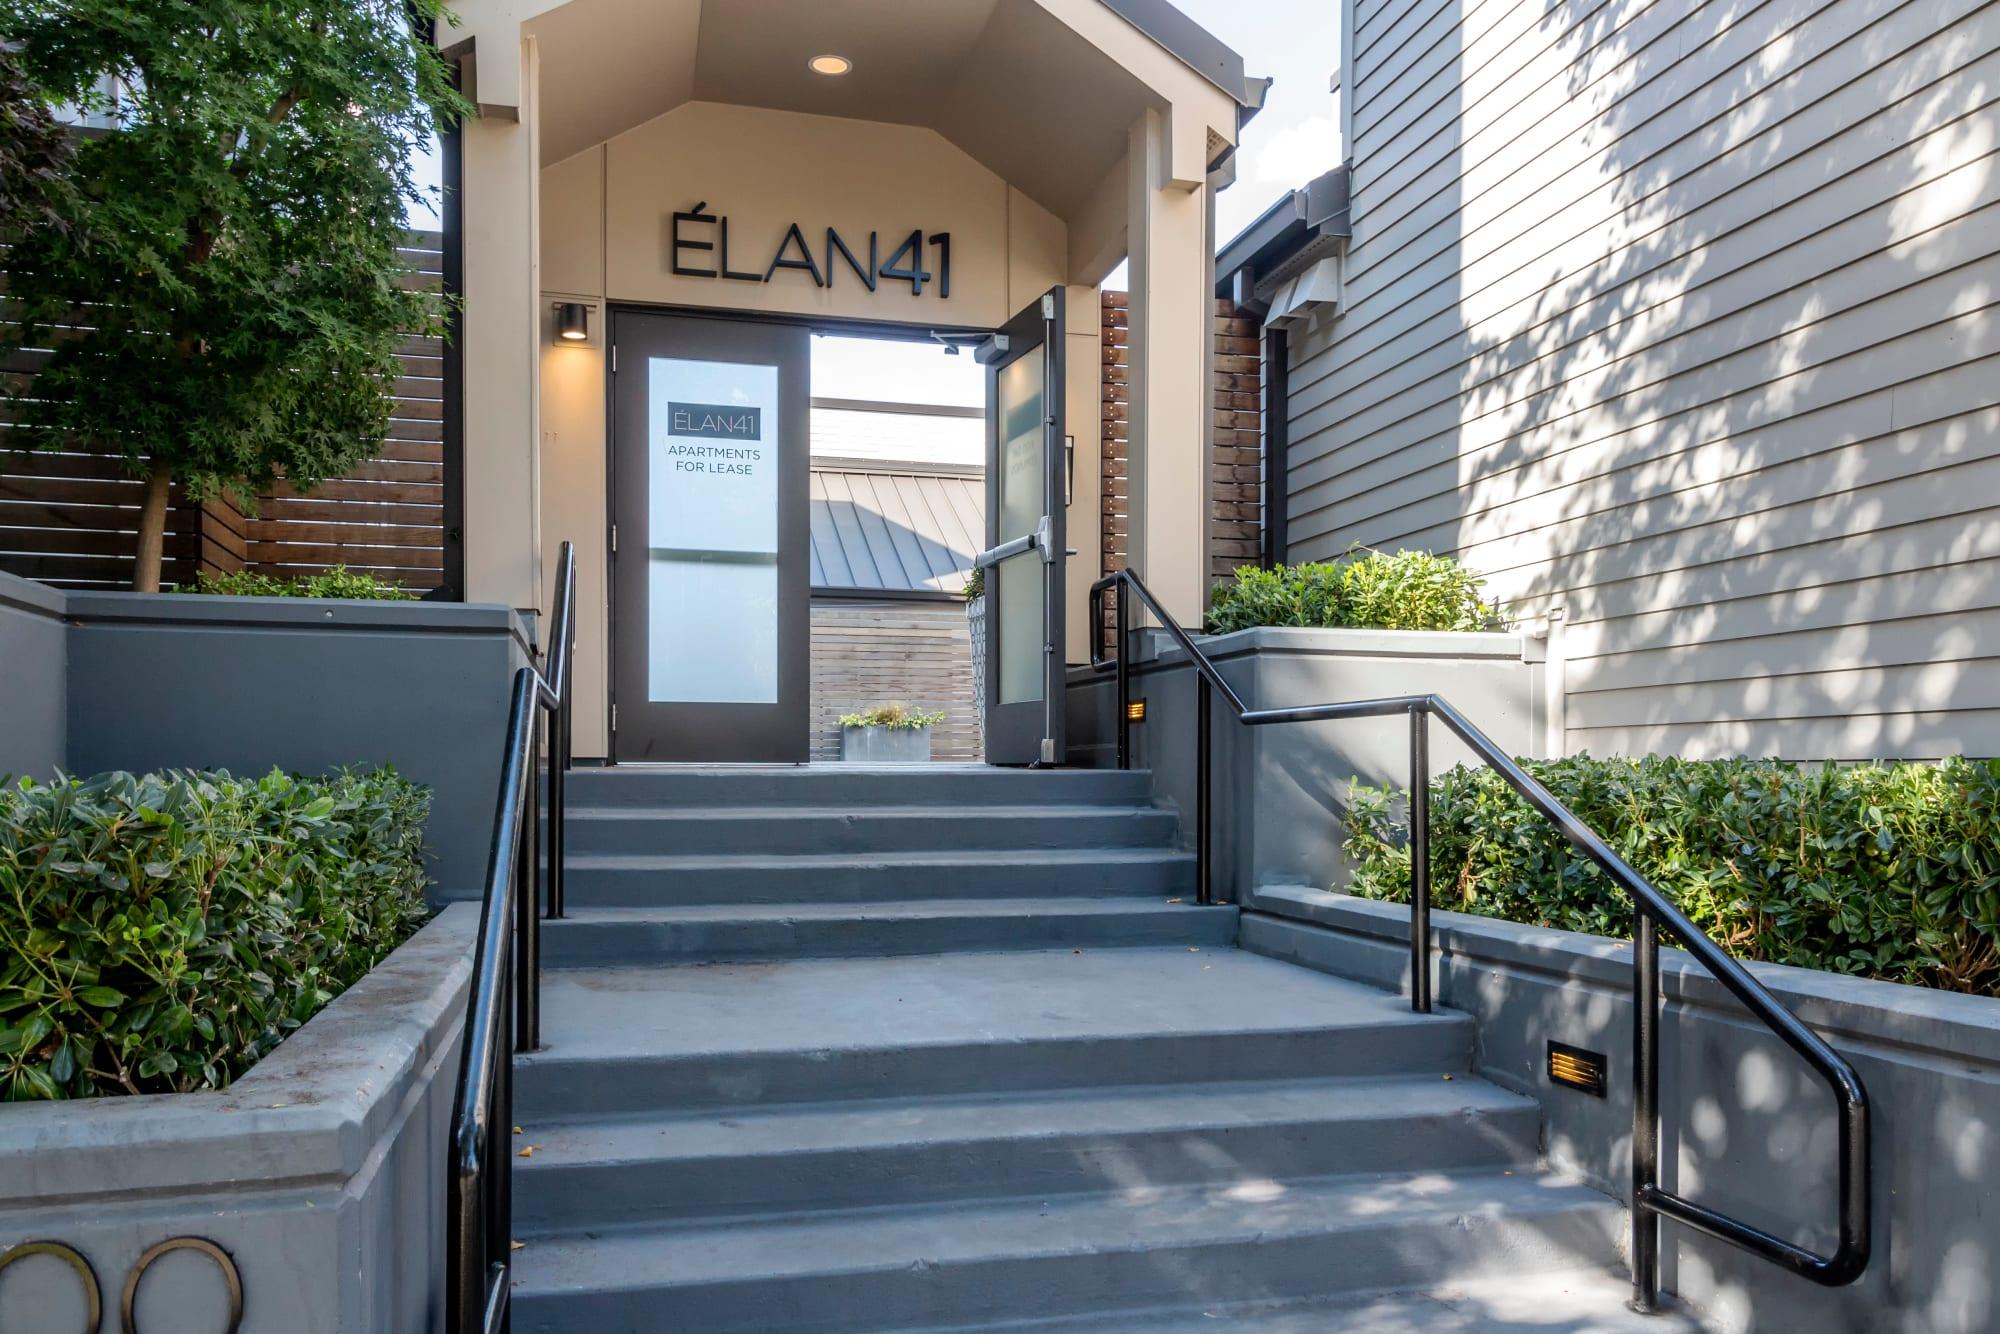 Entrance to property at Elan 41 Apartments in Seattle, WA